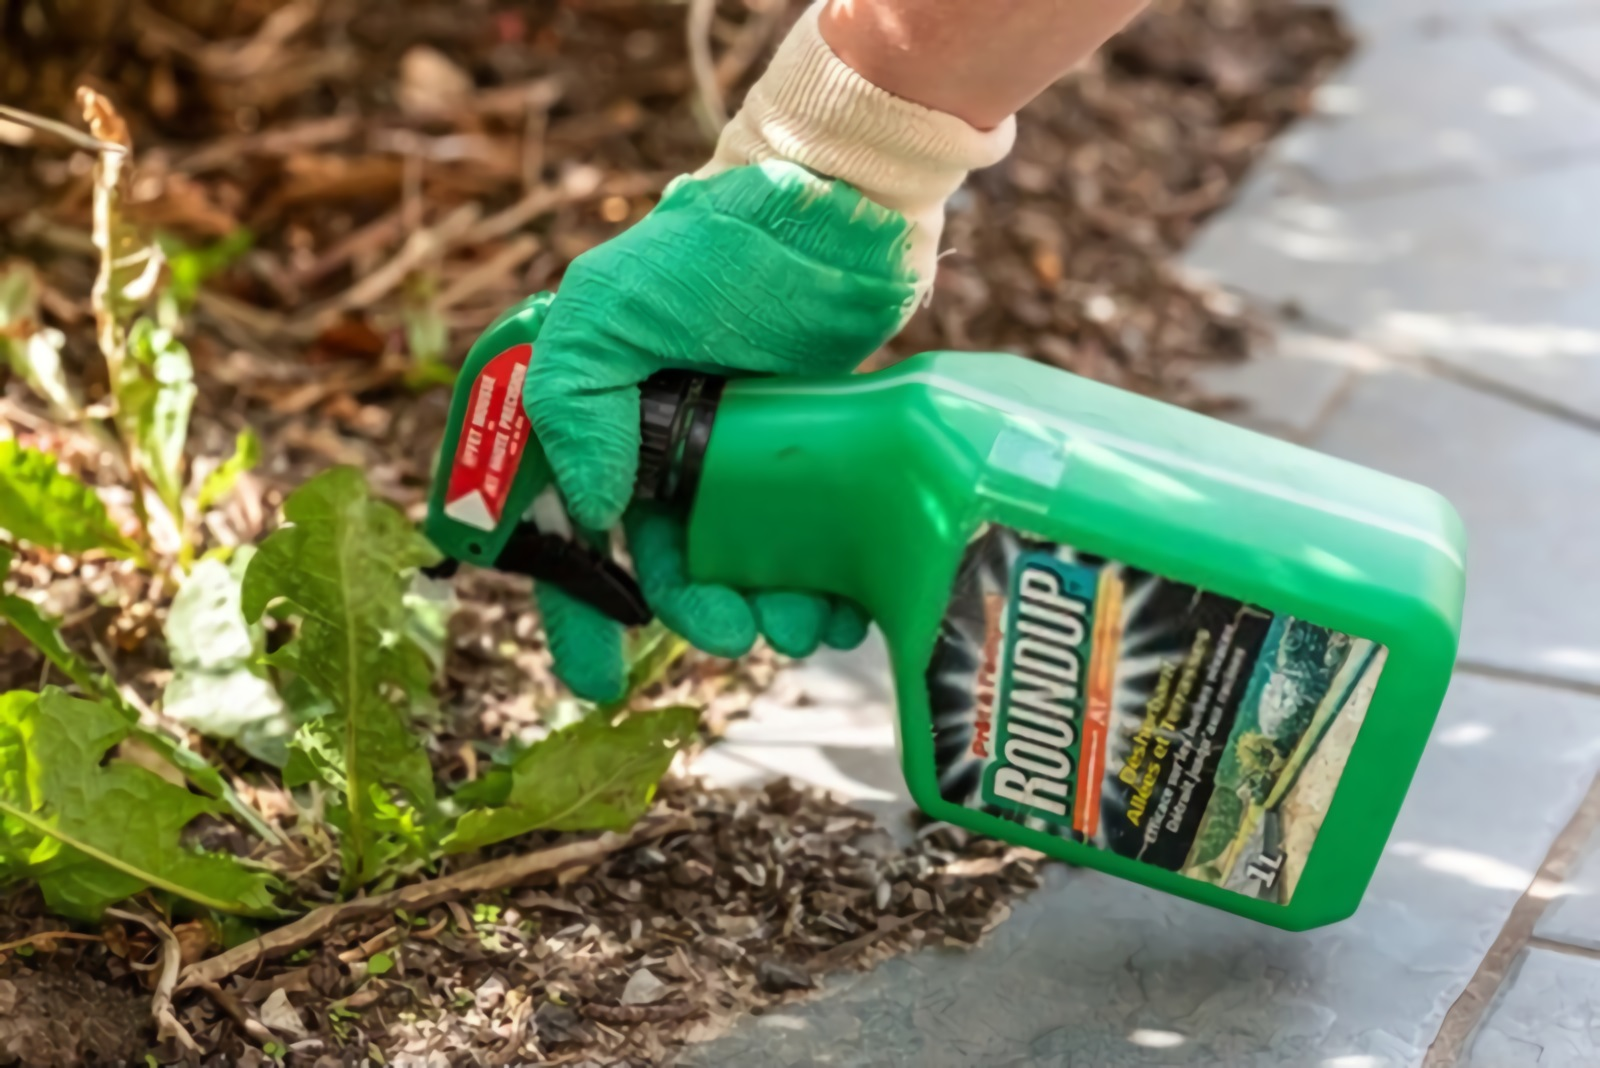 10 Best Weed Killer For Gardens 2020